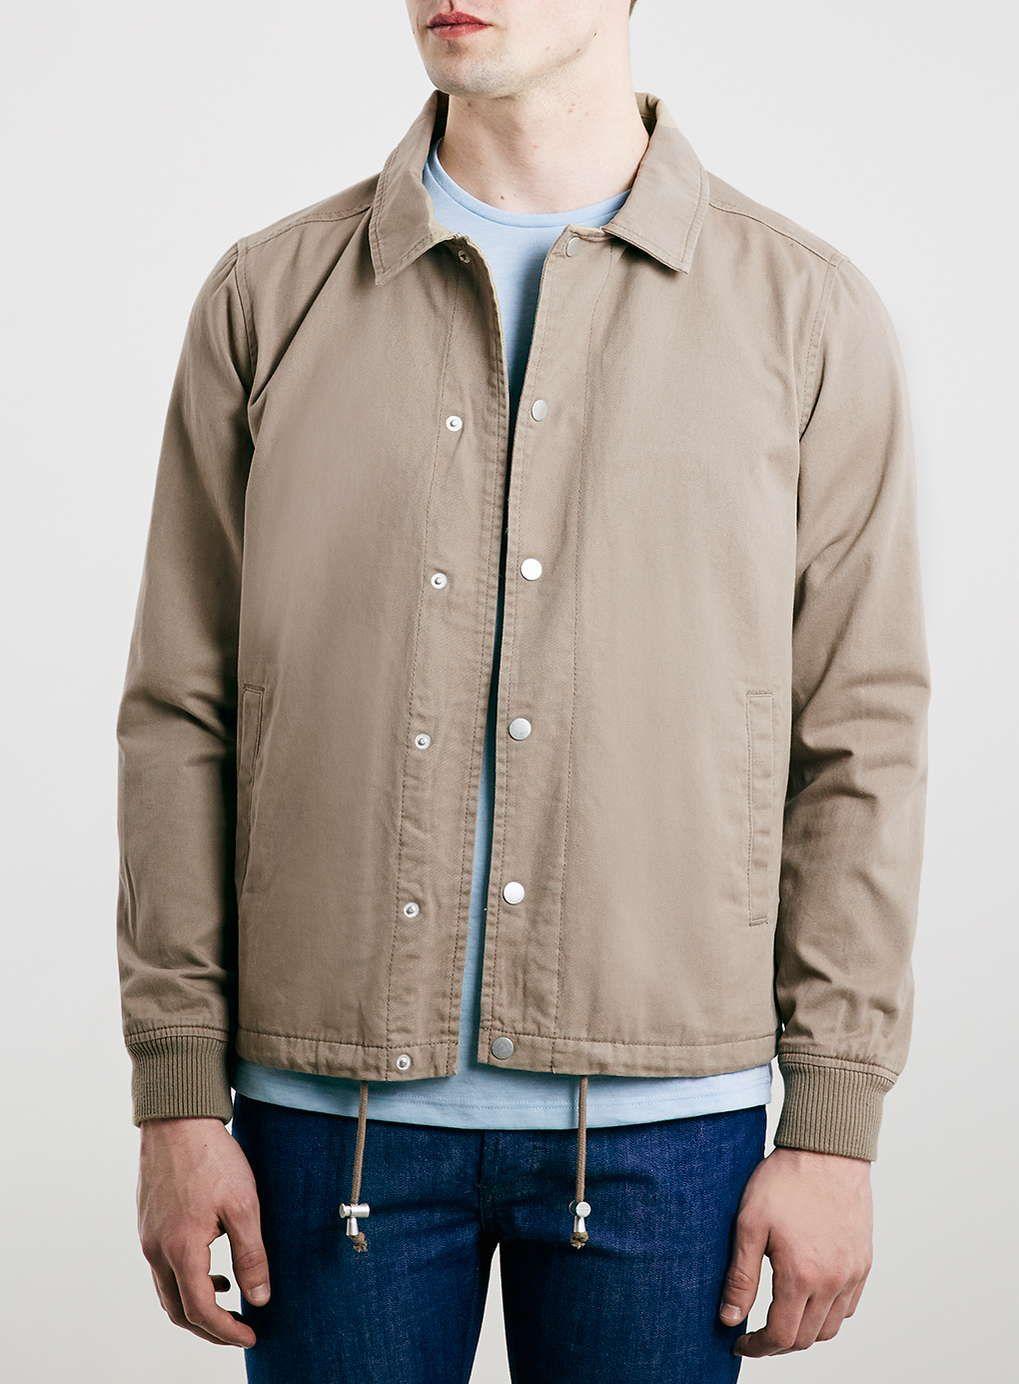 Mens jacket cotton - Stone Cotton Coach Jacket Men S Coats Jackets Clothing